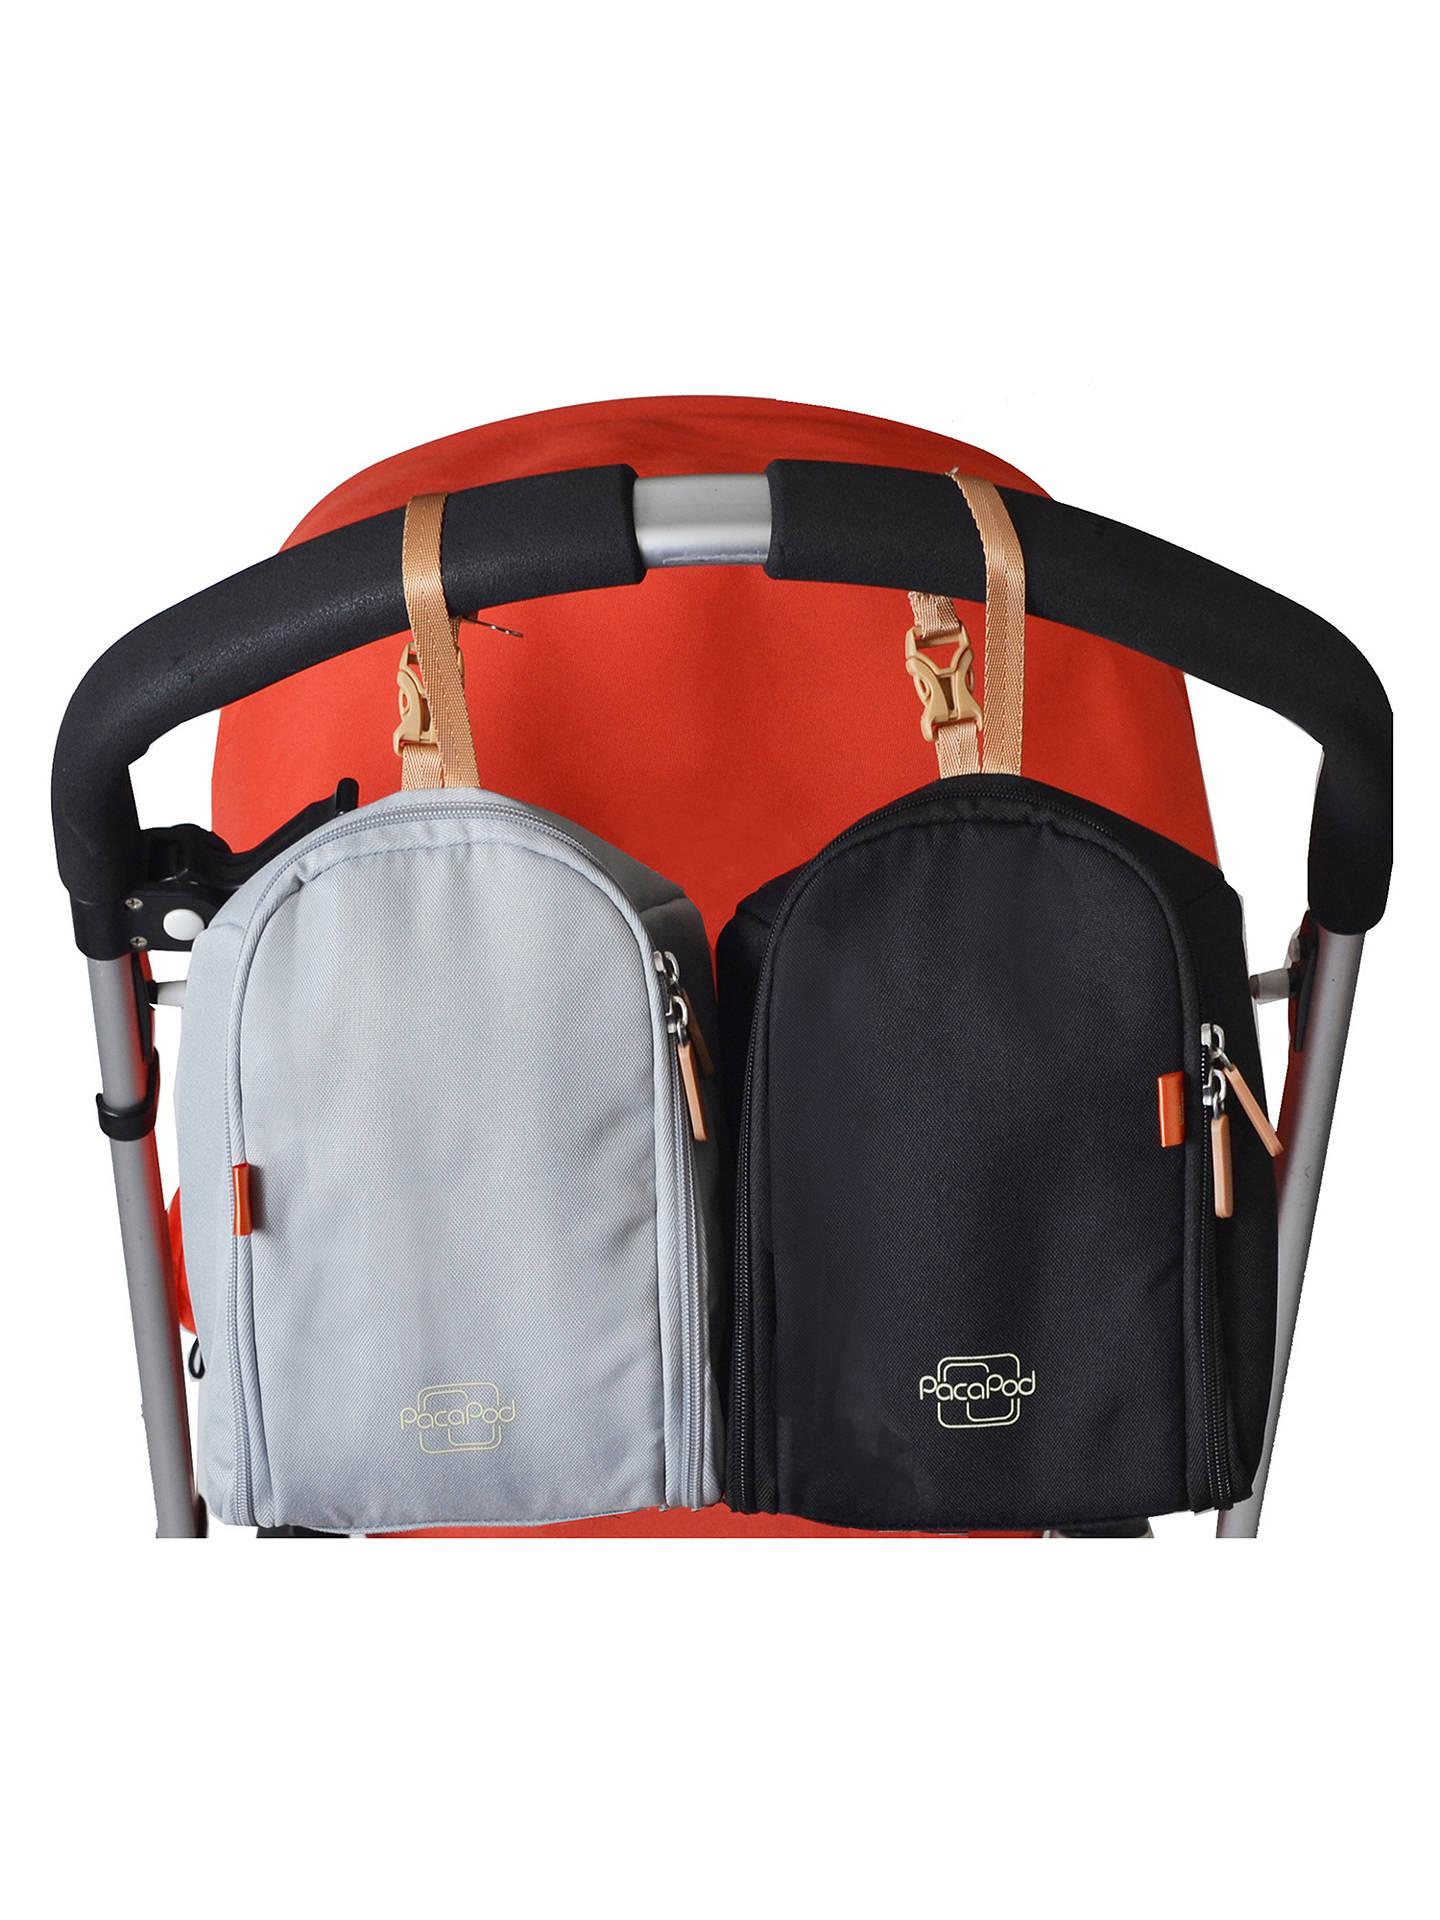 6f2c35dc8aa2c ... Buy PacaPod Prescott Combi Changing Bag, Charcoal Black Online at  johnlewis.com